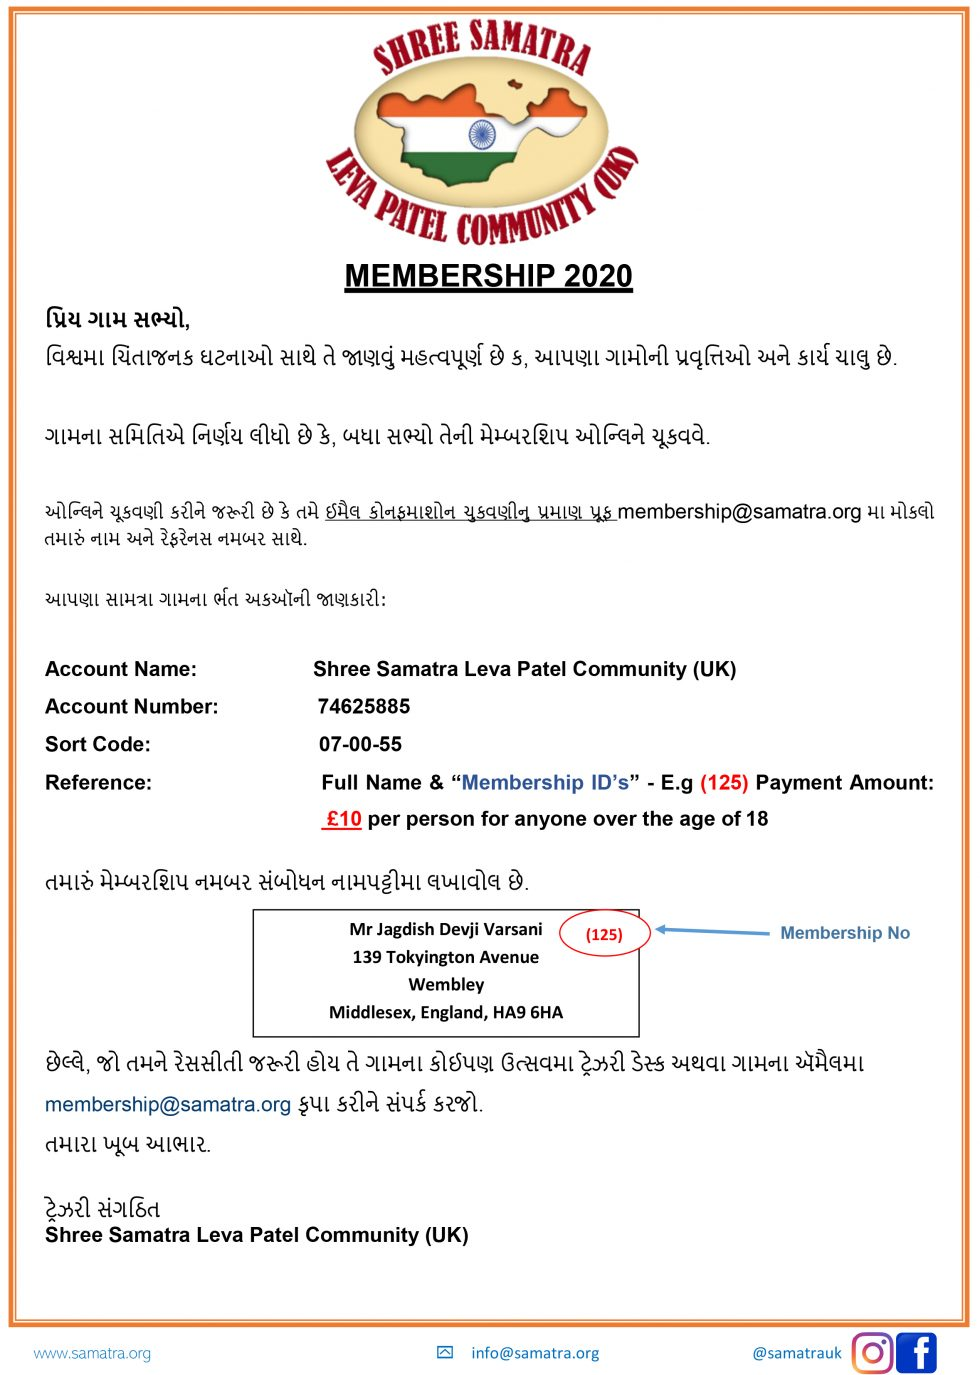 Samatra Newsletter - 13